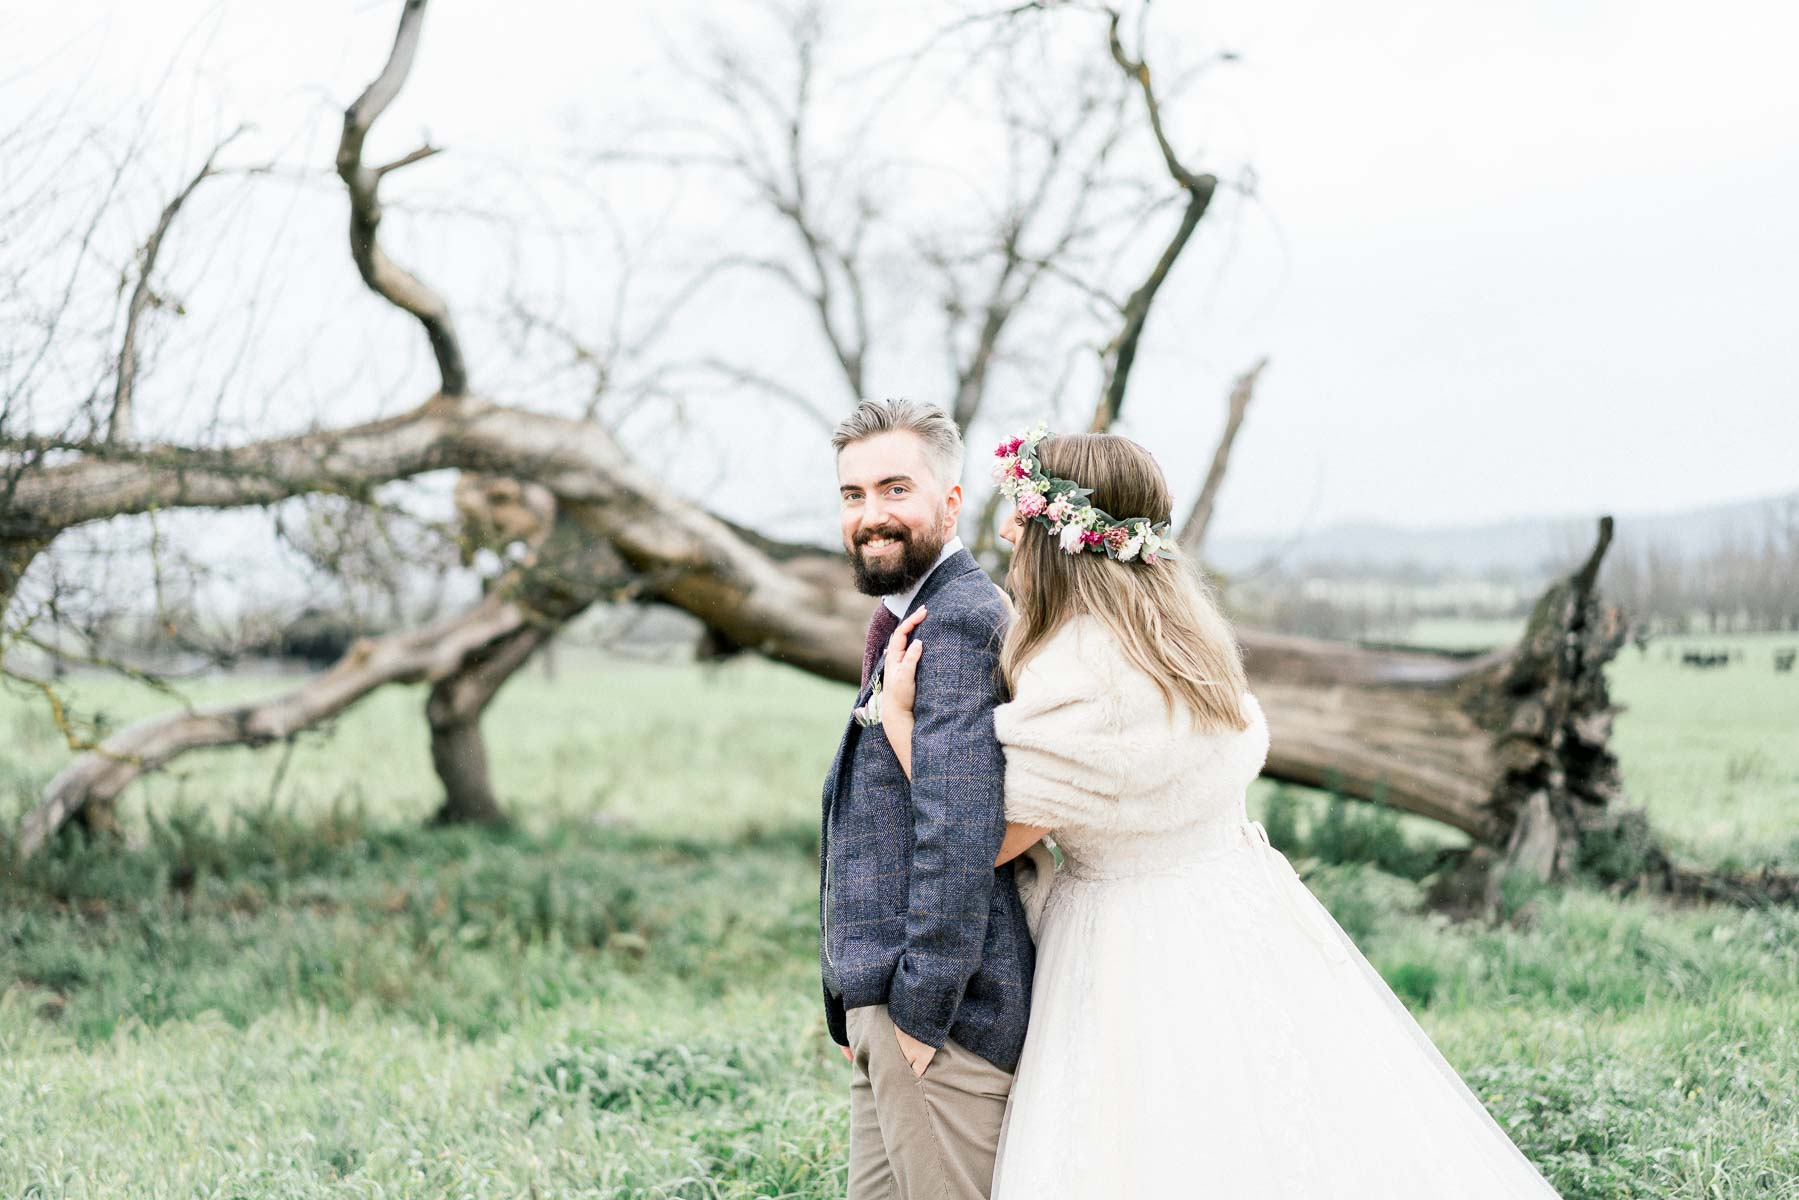 adams-farm-coldstream-yarra-valley-wedding-heart+soul-weddings-kel-jarryd-05606.jpg